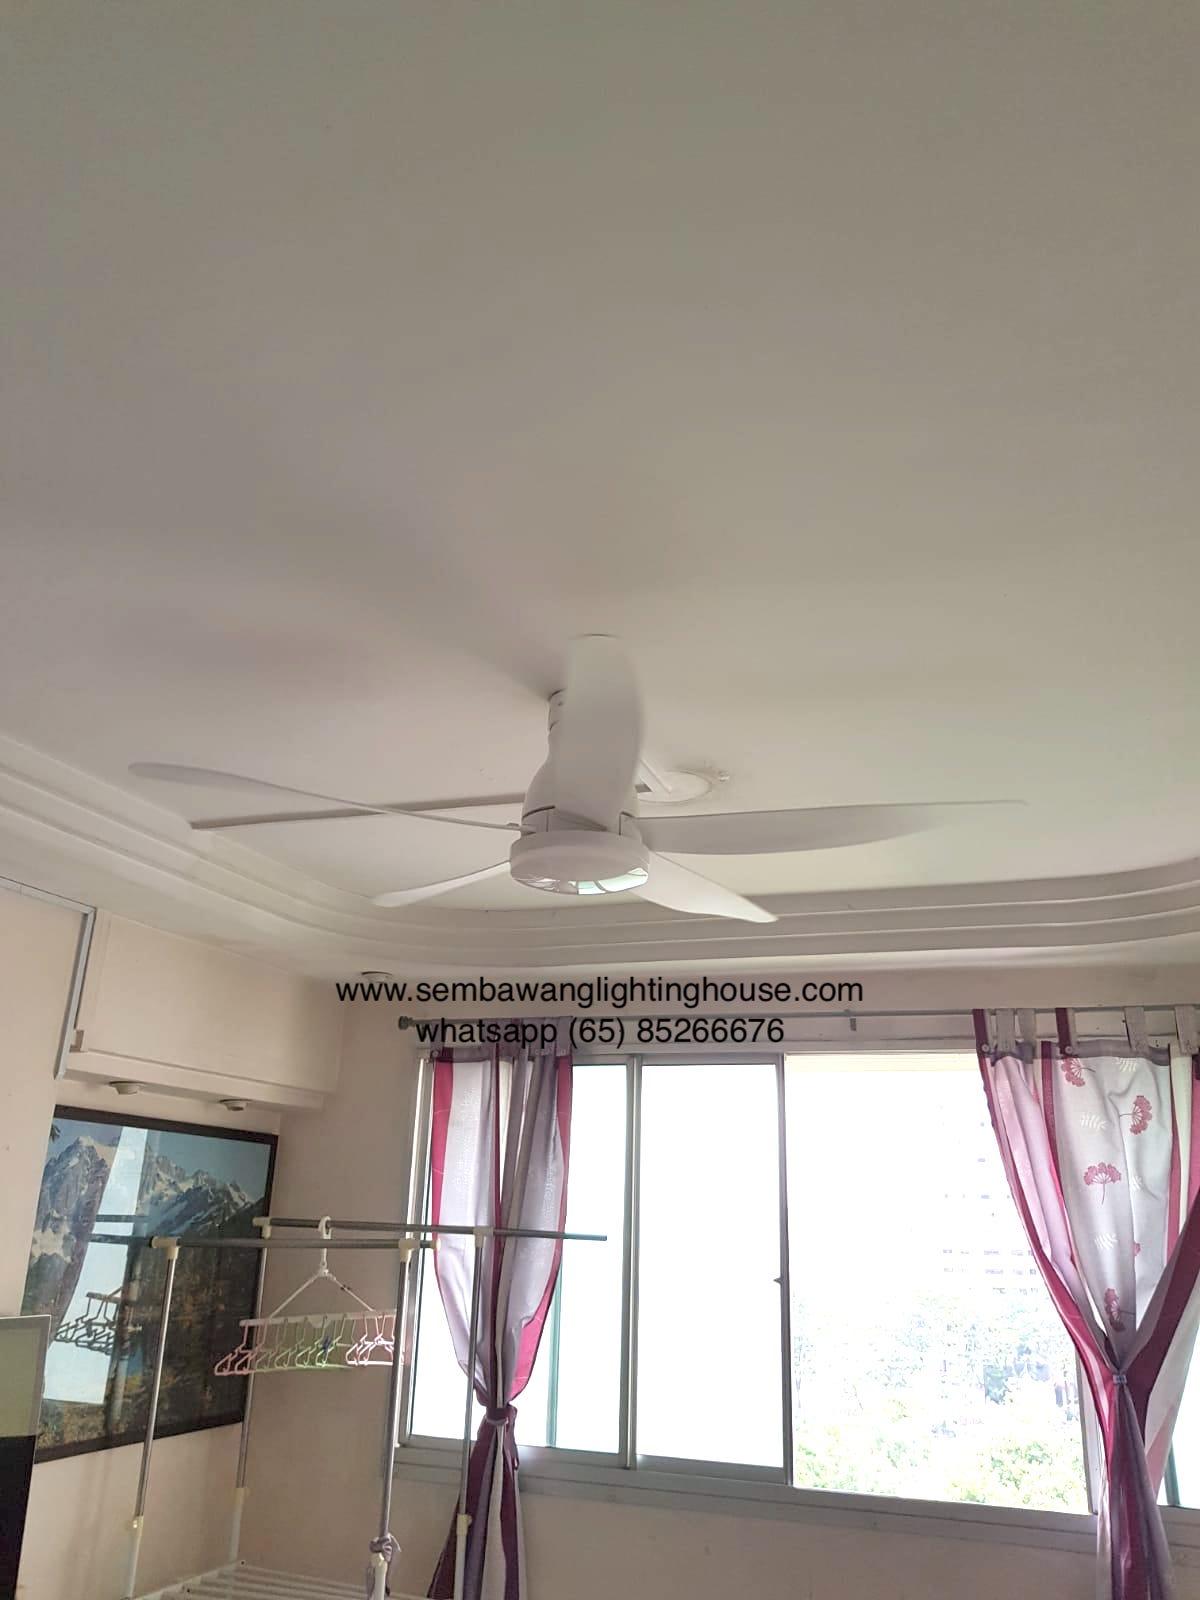 kdk-u60fw-white-ceiling-fan-sembawang-lighting-house-sample-04.jpg